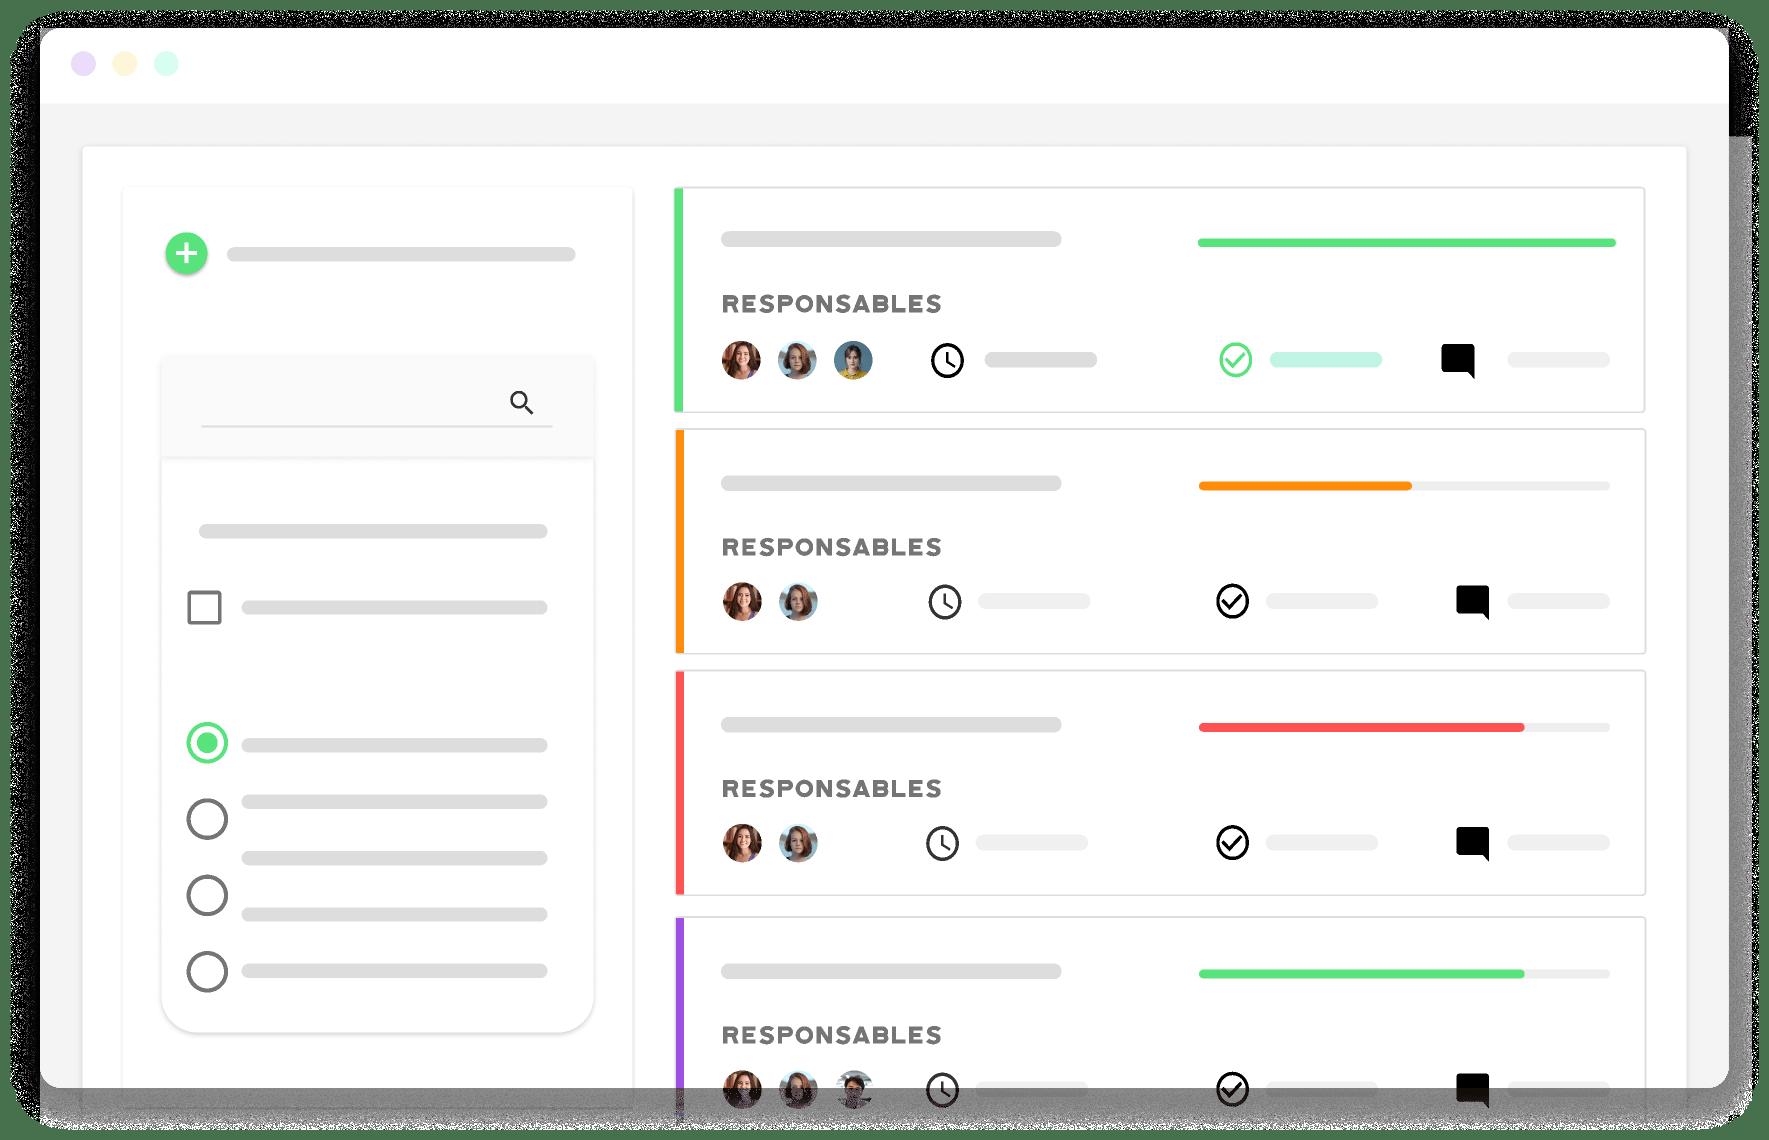 ejemplo de interfaz del software de Kenjo